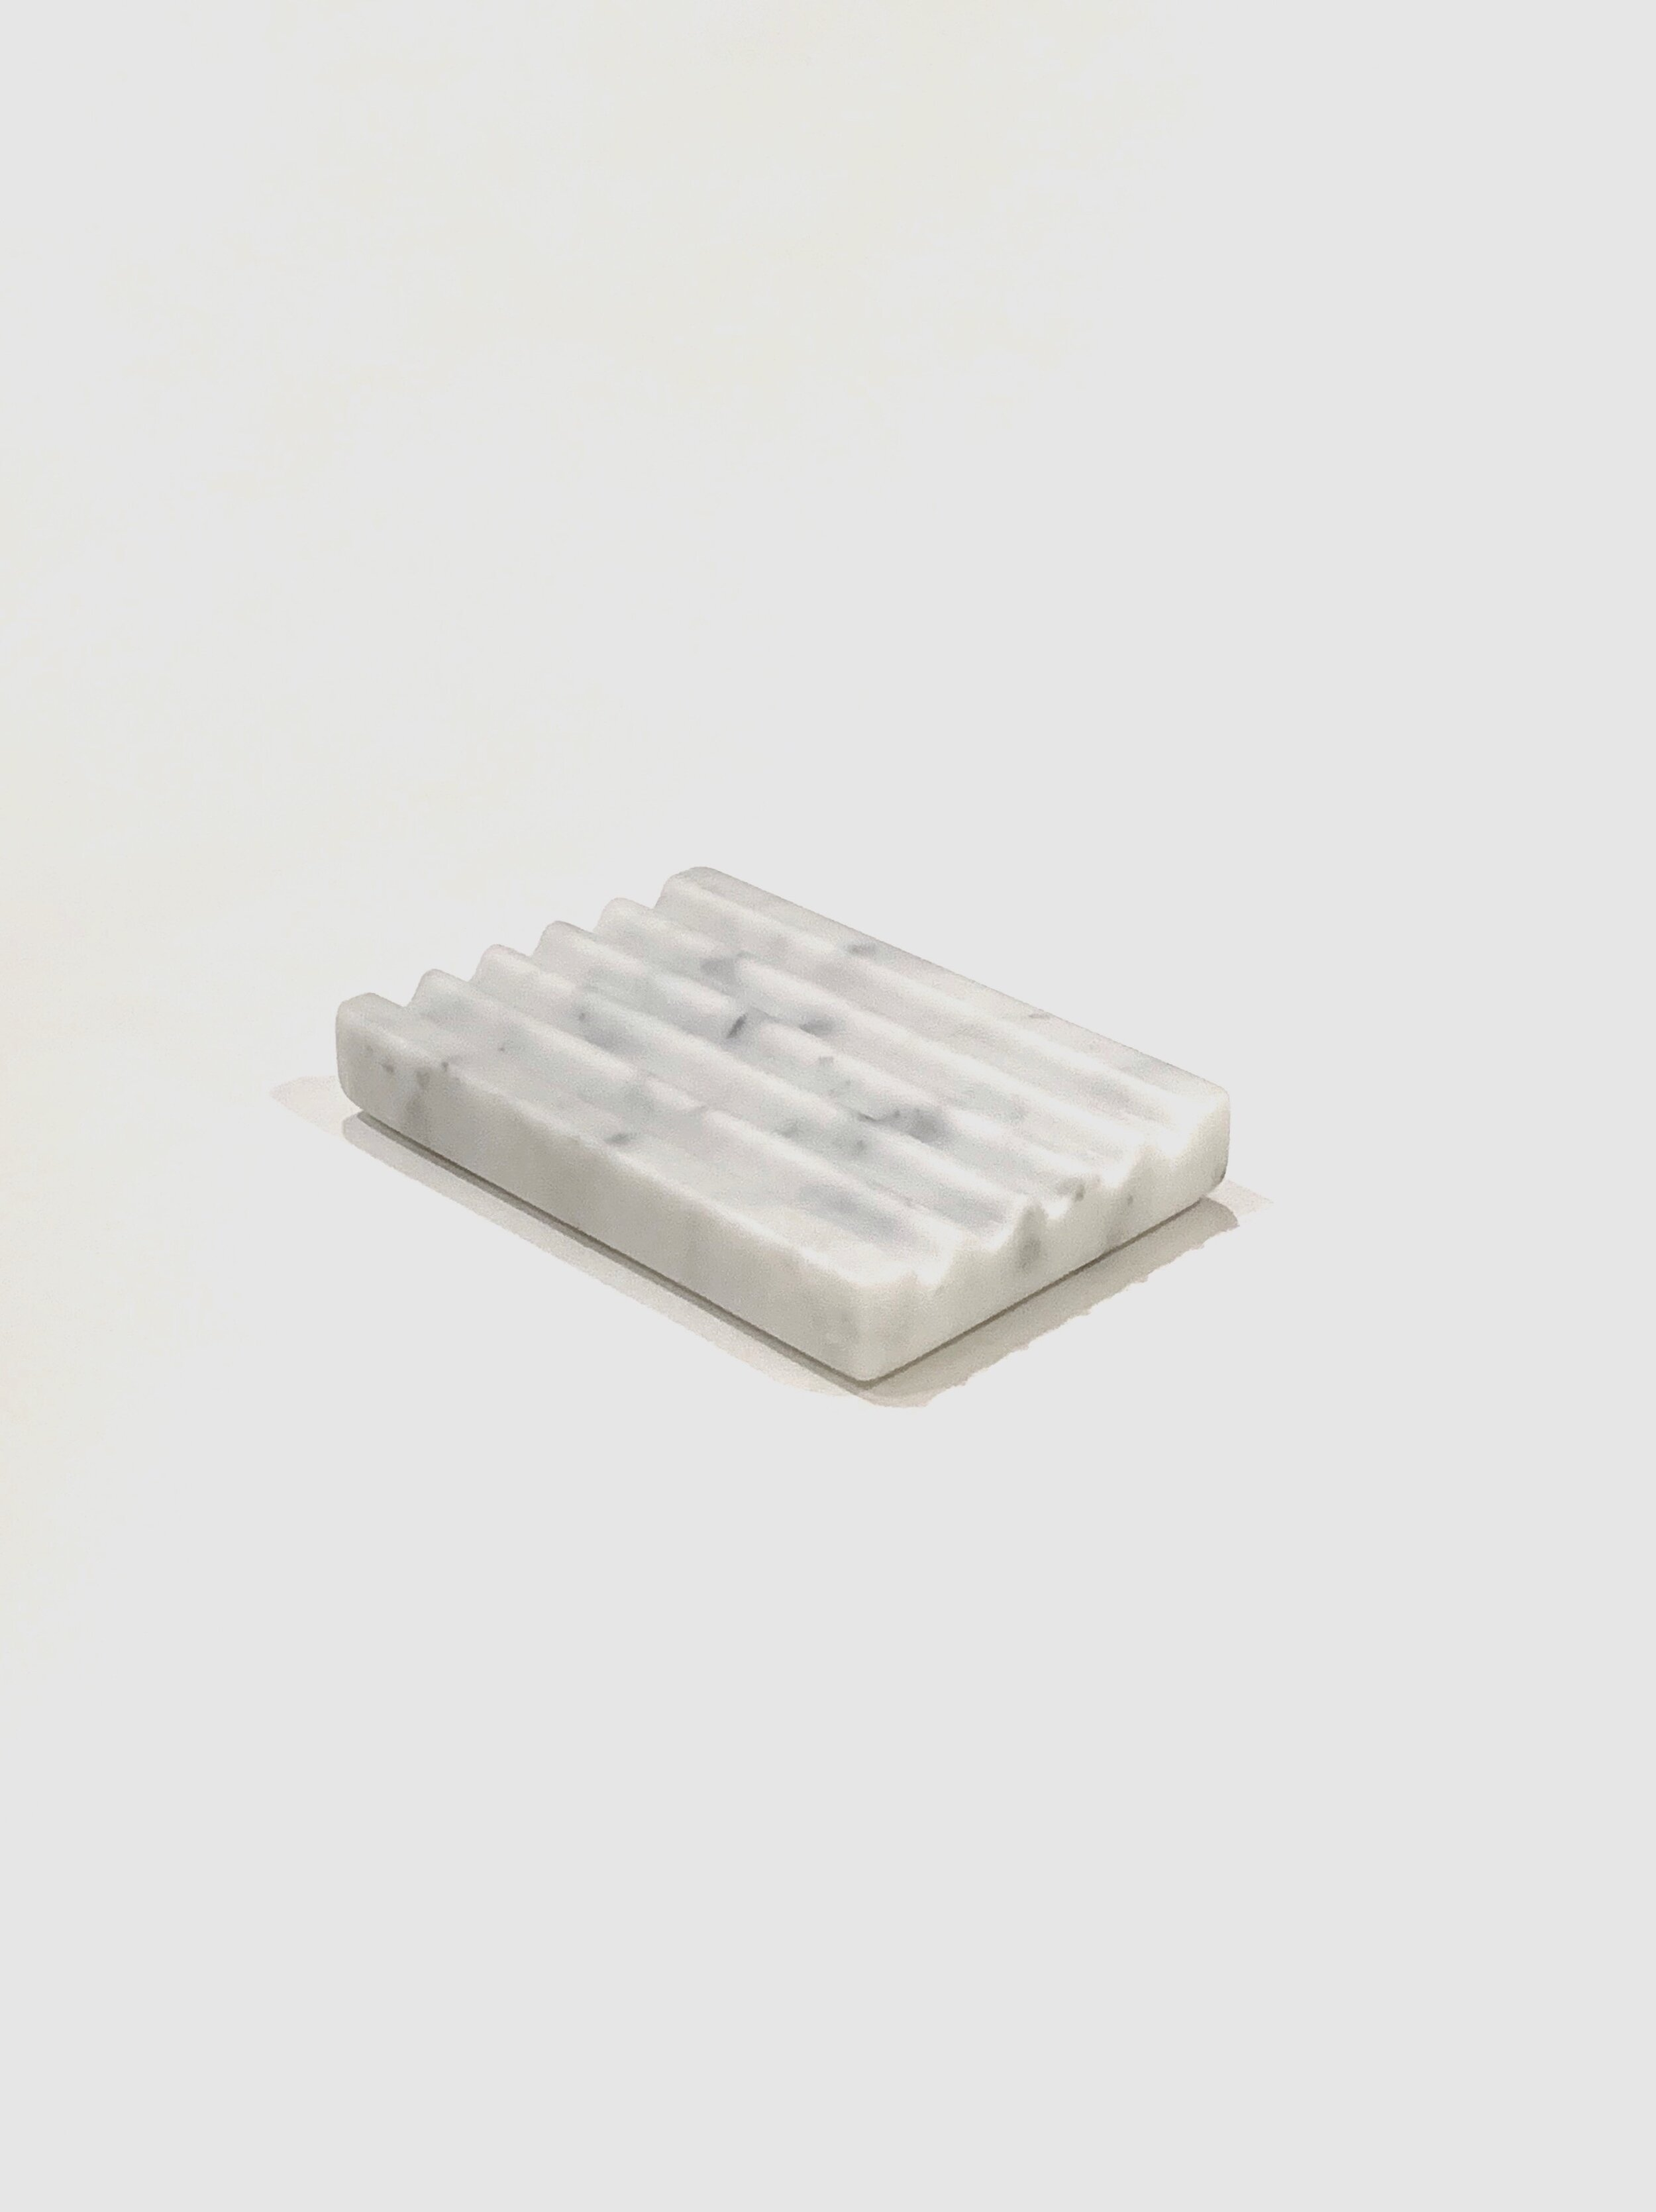 OMBAK   Marble soap dish  -   SIZE   12cm(W) x 8.5cm(D)  -   PRICE   Rp. 360.000